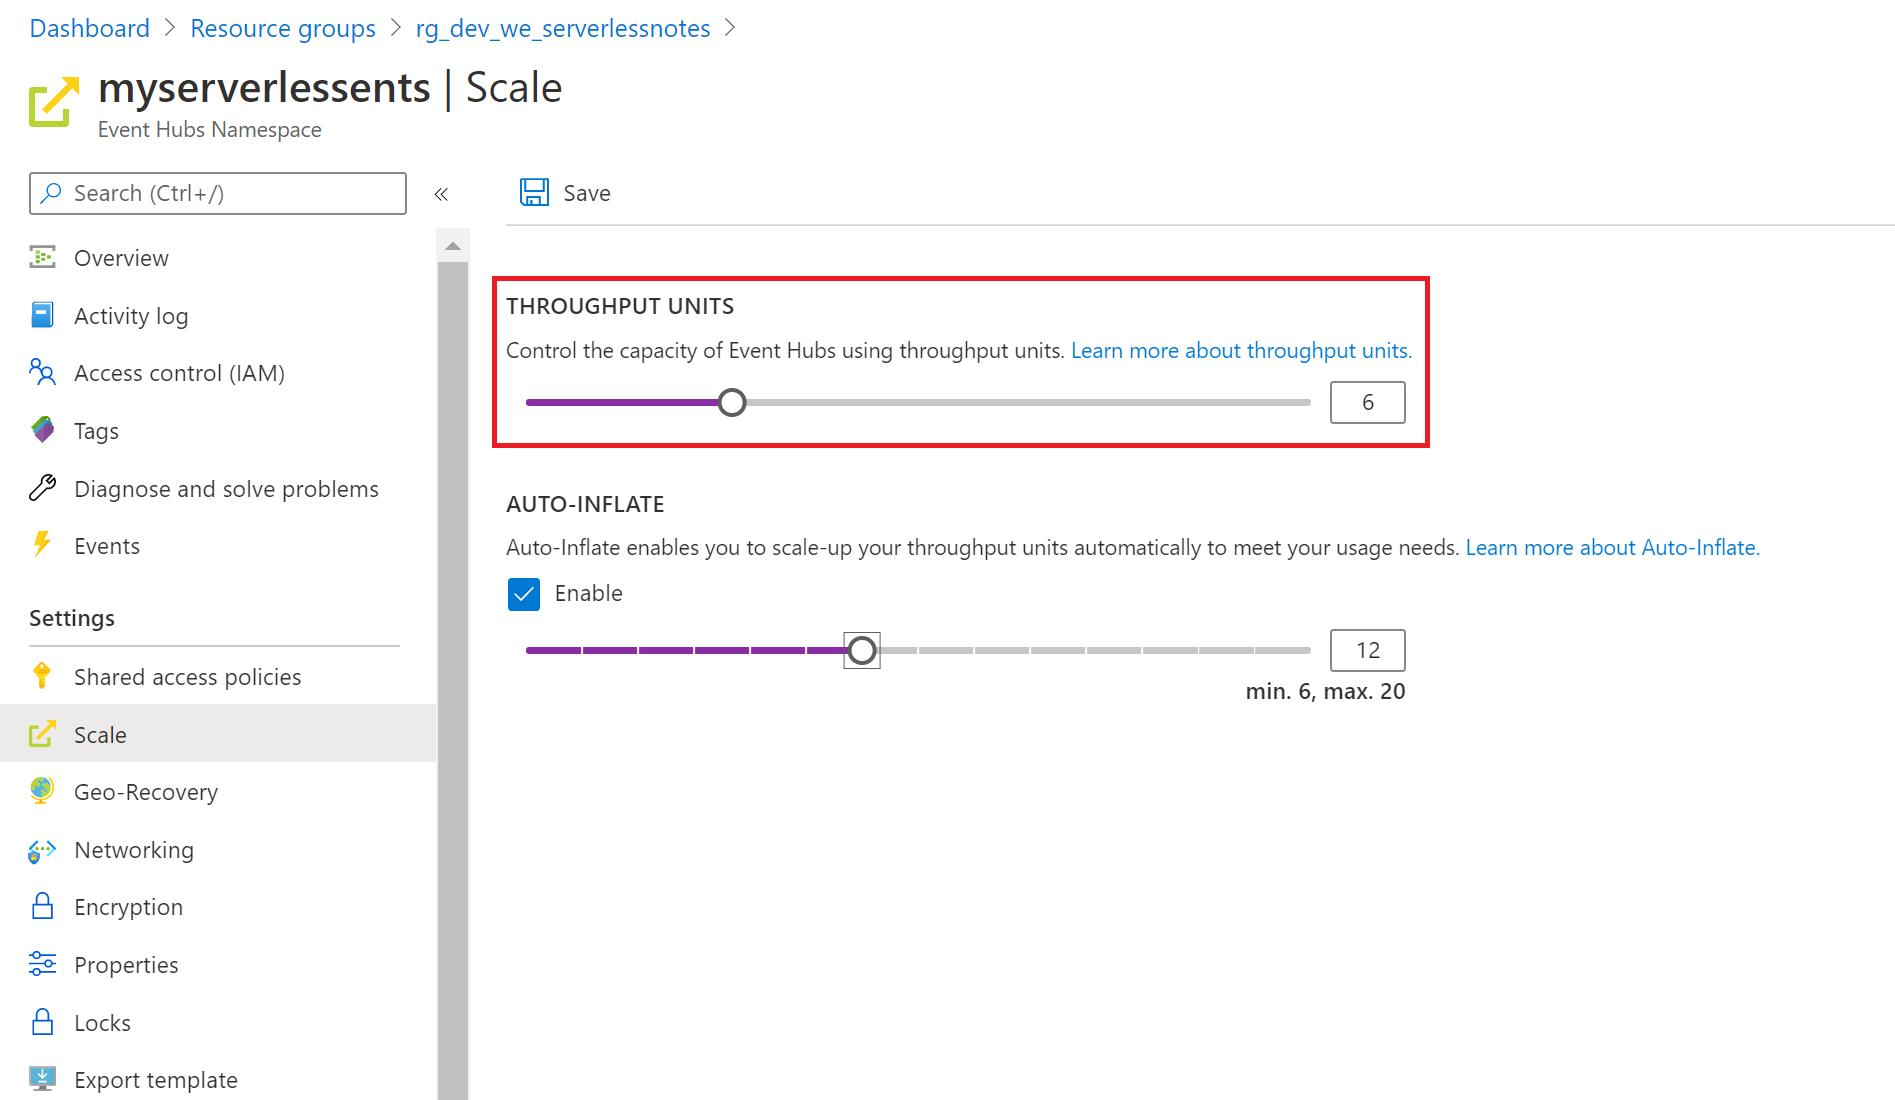 Azure Event Hub Scalability